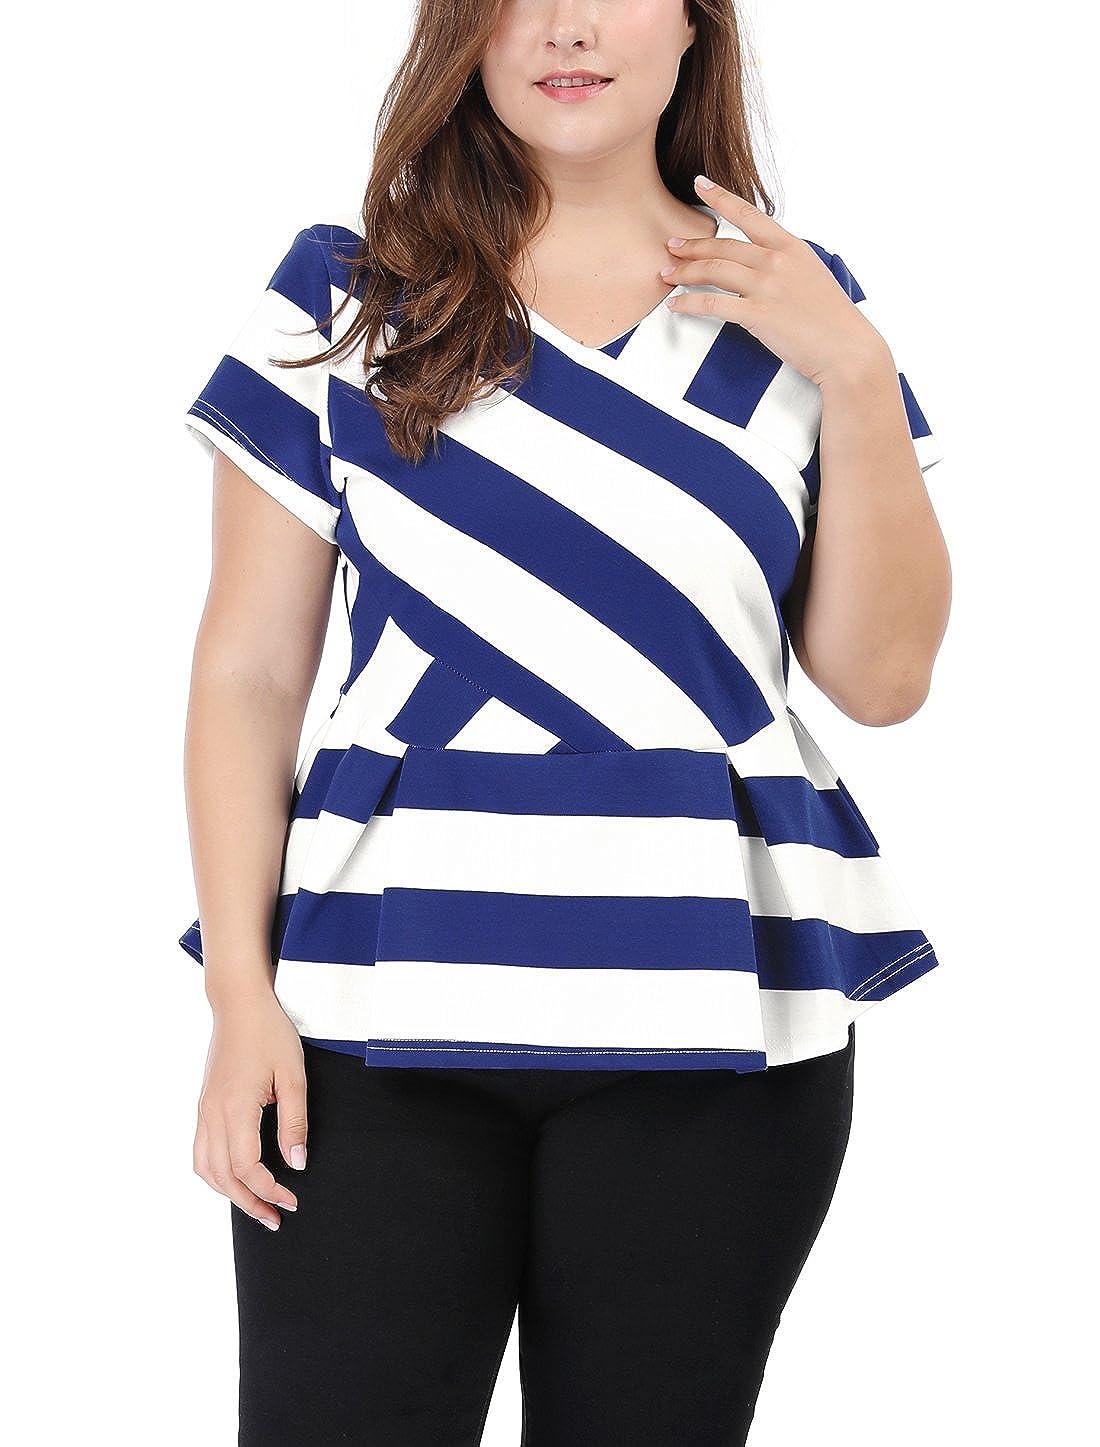 uxcell Agnes Orinda Women's Plus Size Short Sleeve Striped Shirt V-Neck Peplum Top g16112800ux0032